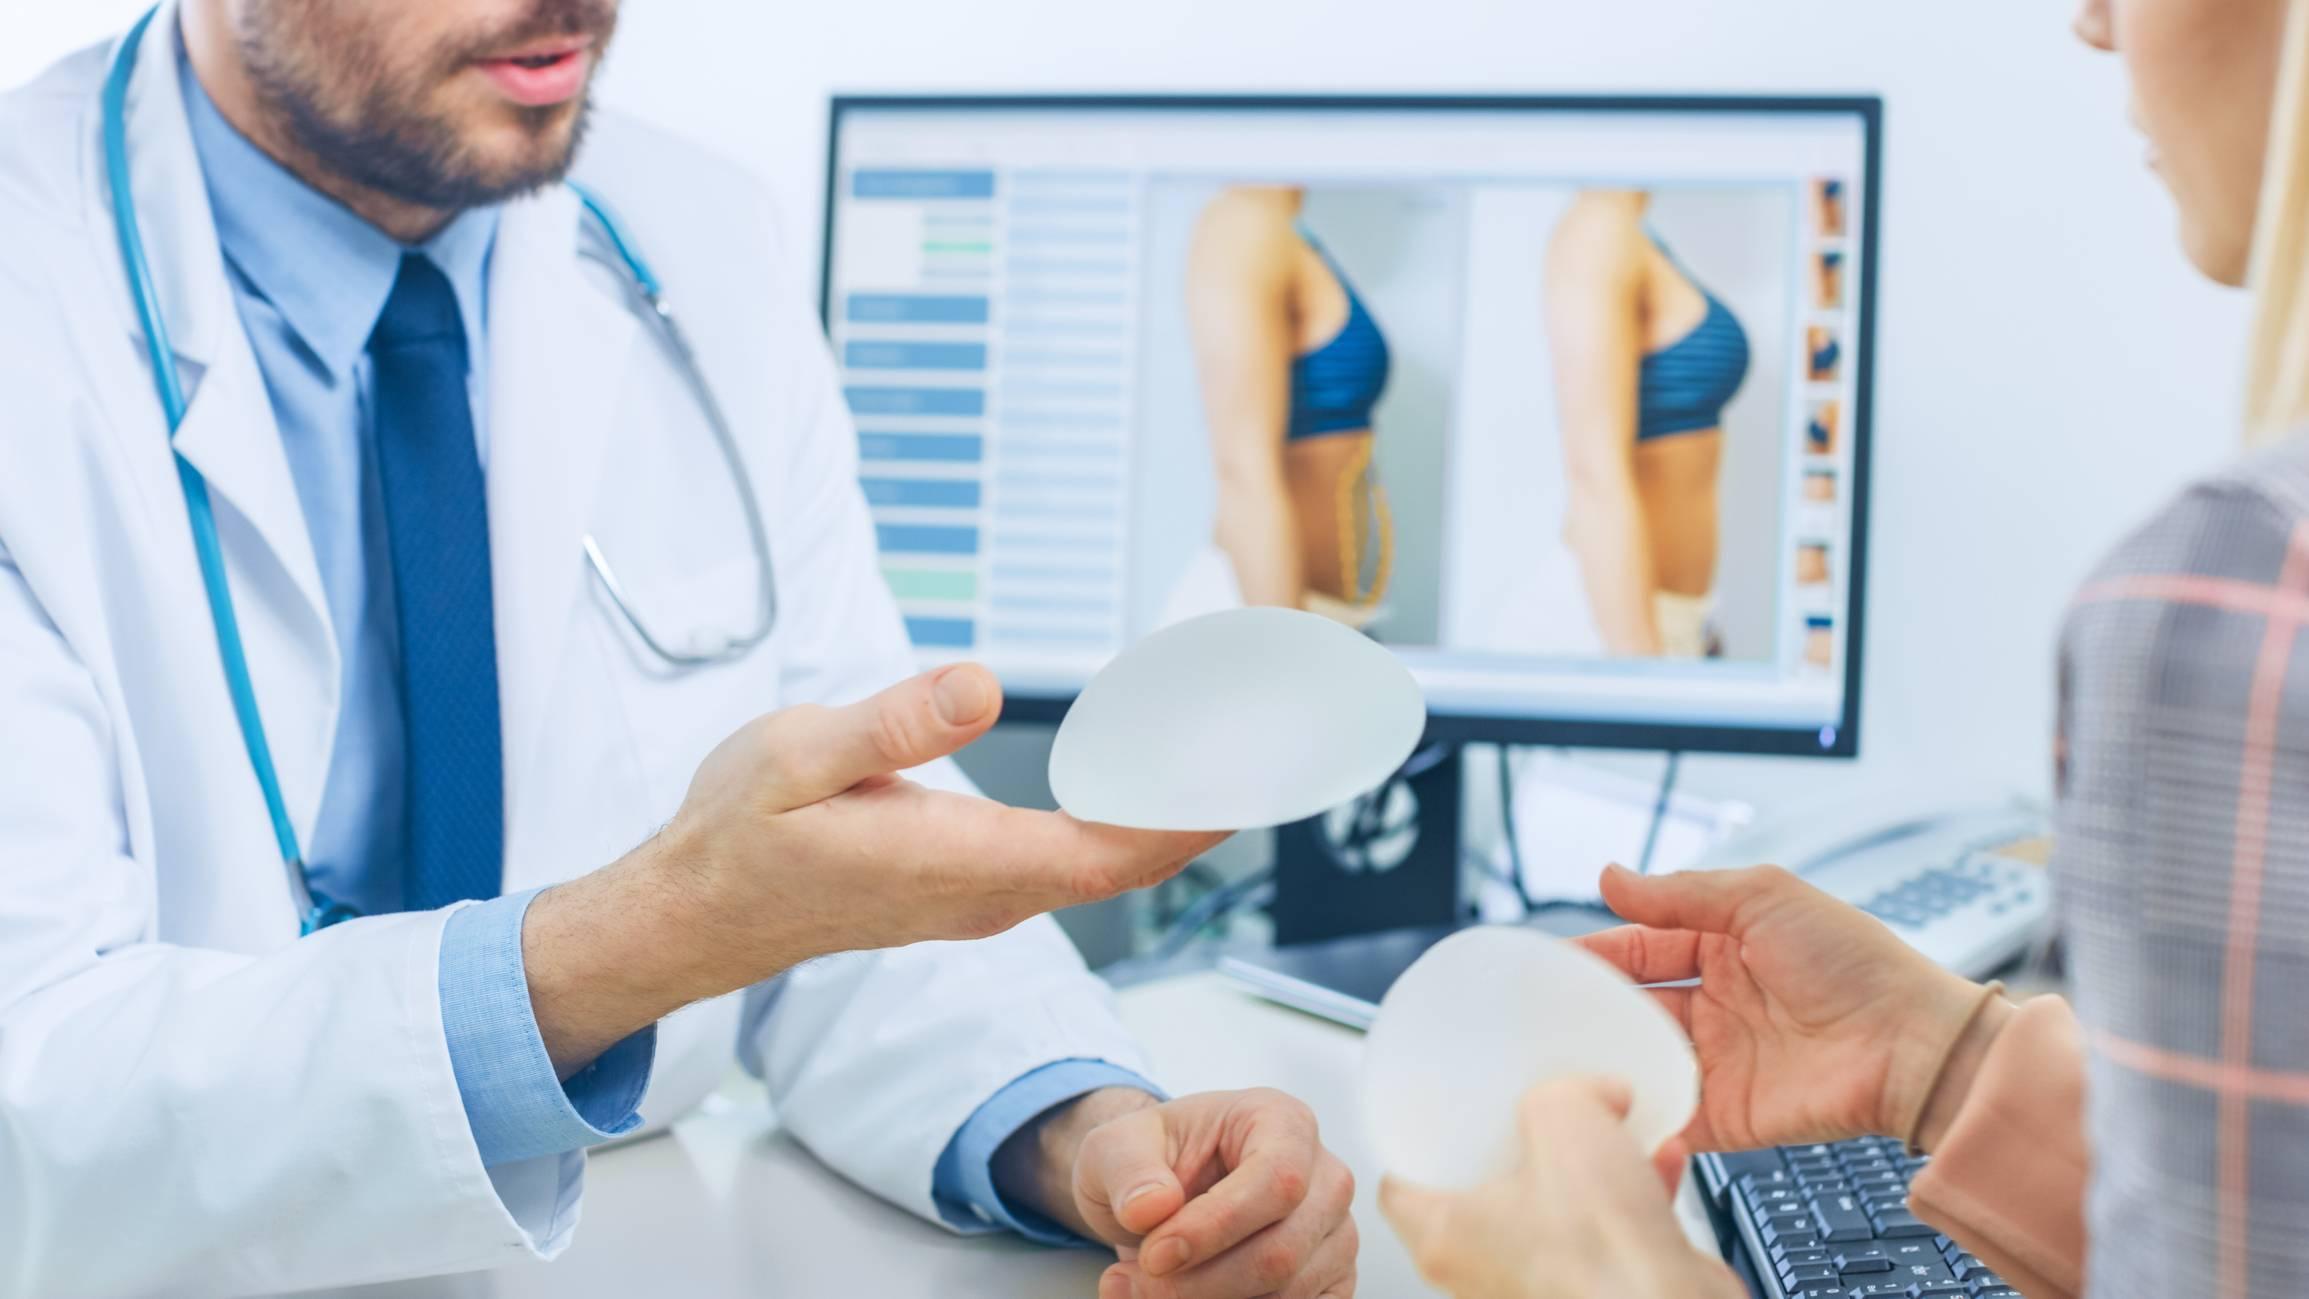 Consultation avant chirurgie mammaire